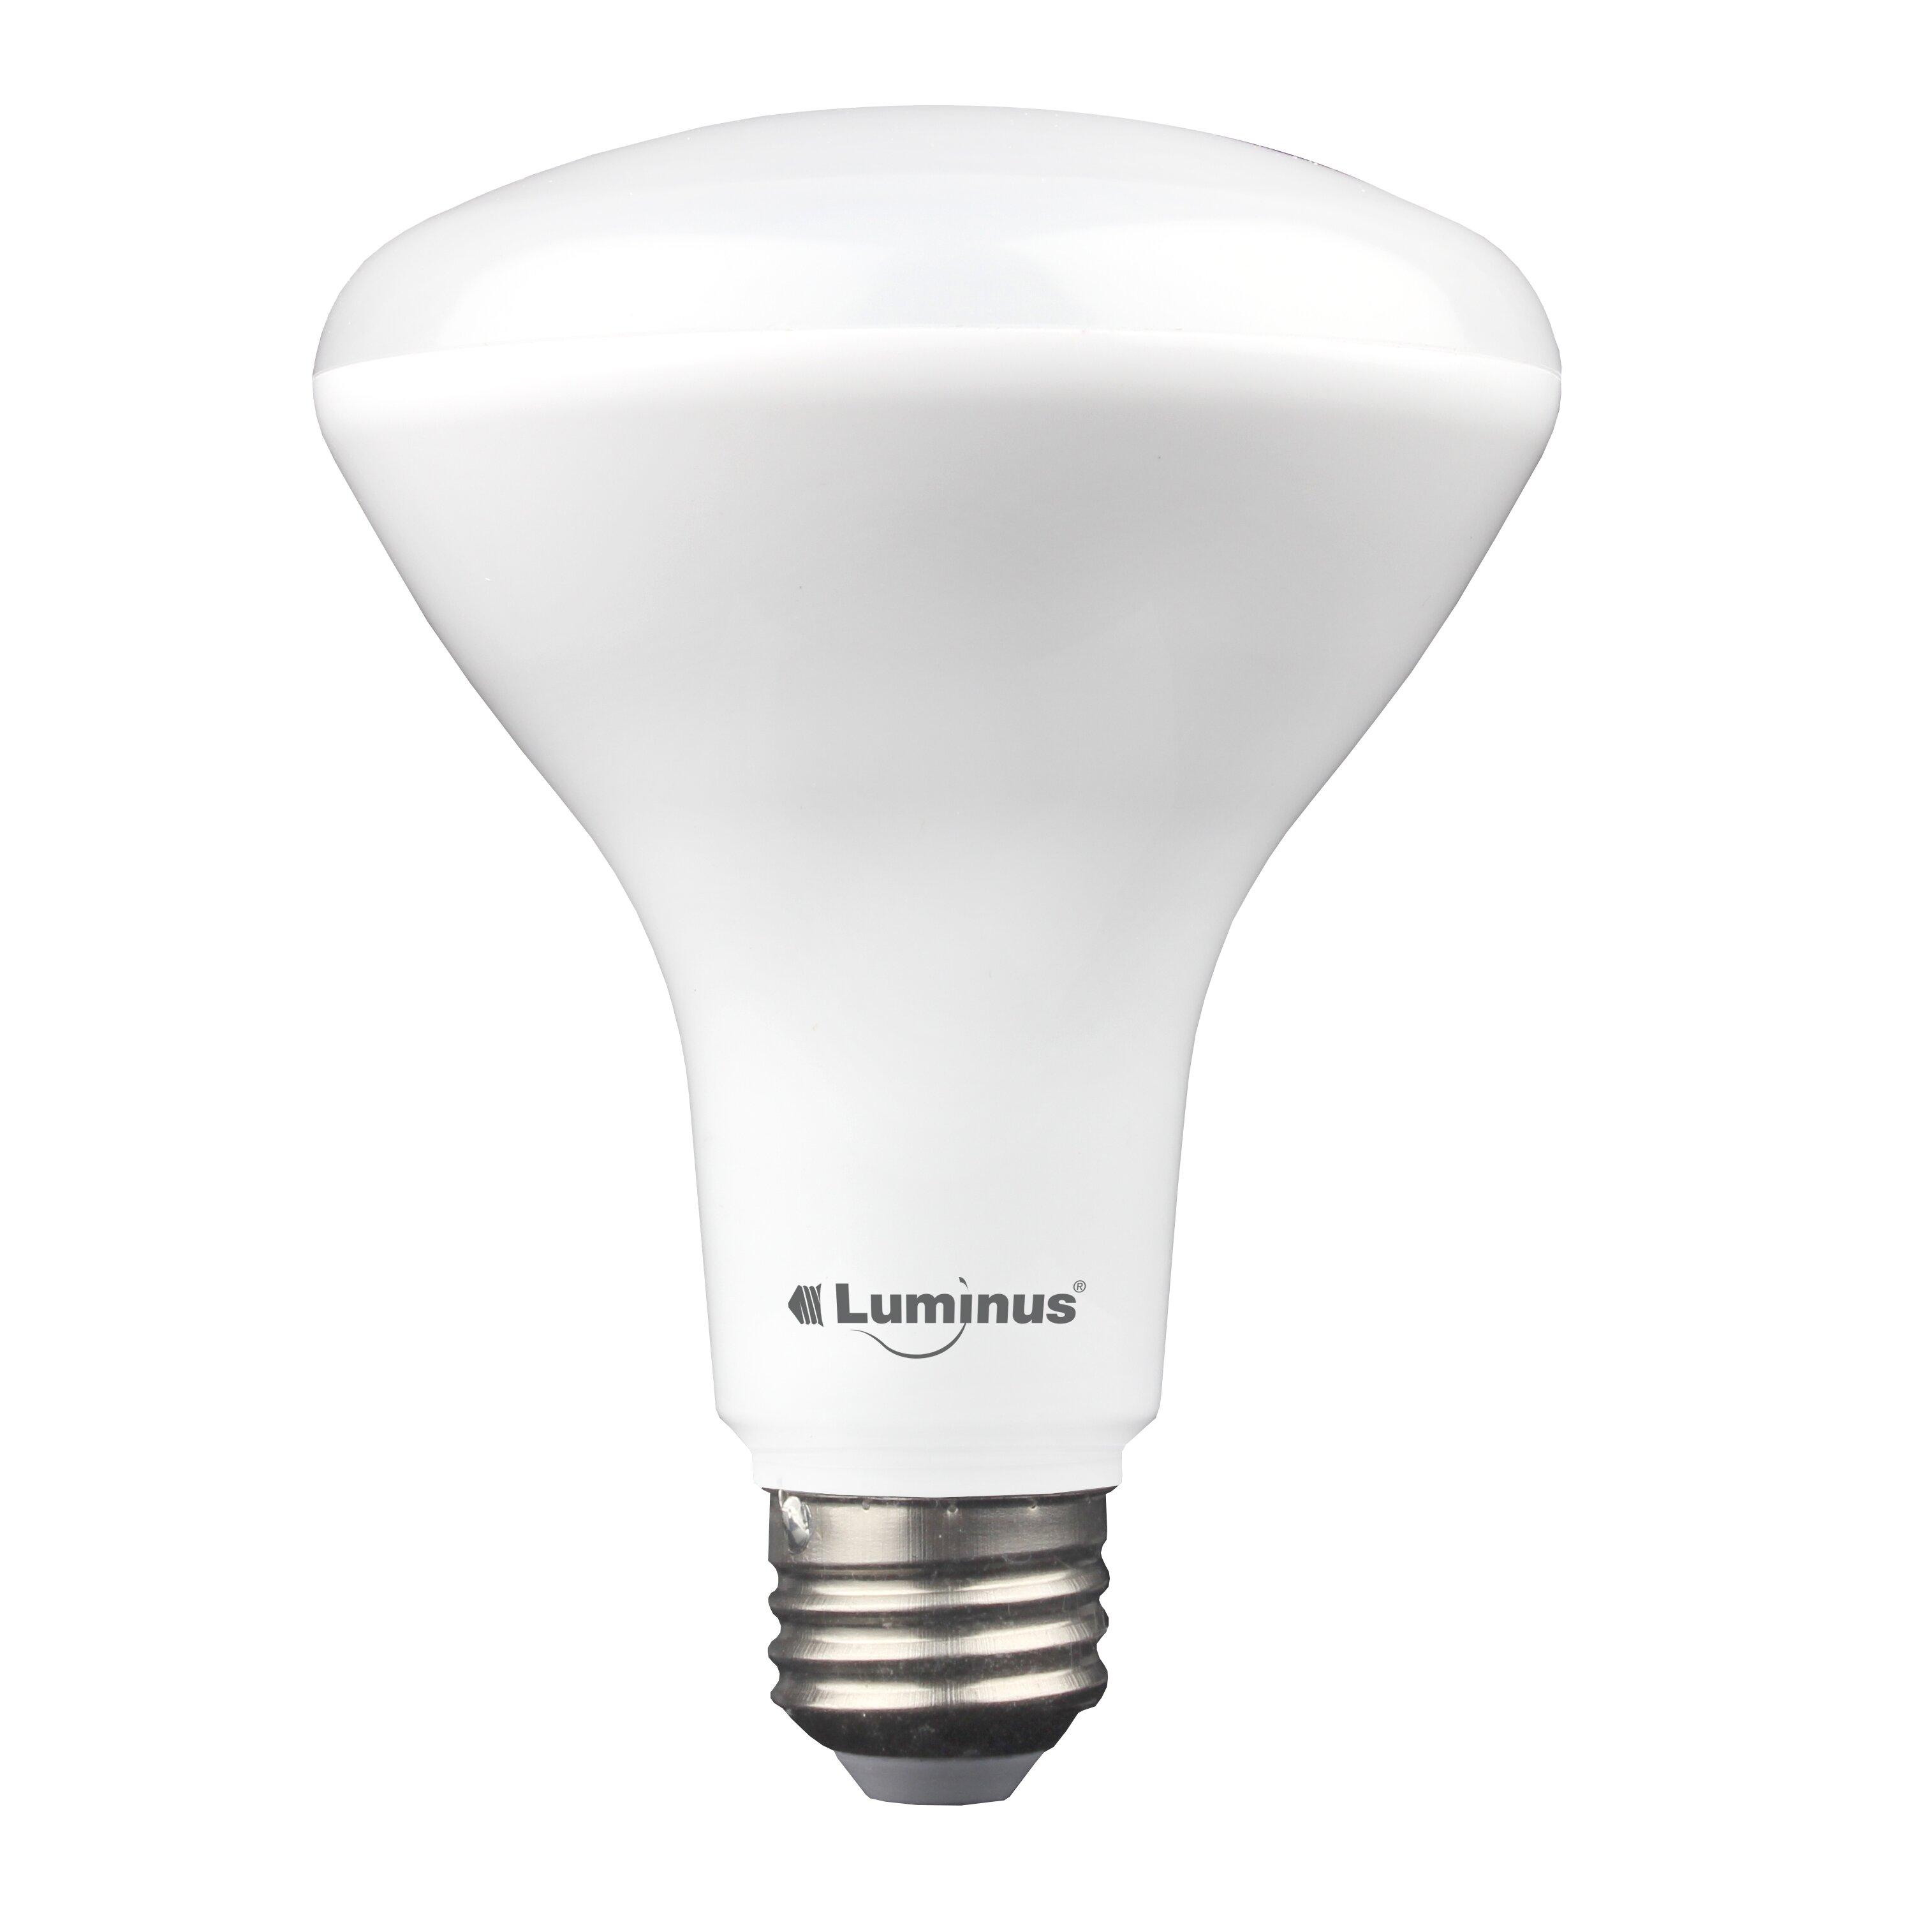 luminus 11w br30 medium led light bulb pack of 6 reviews wayfair. Black Bedroom Furniture Sets. Home Design Ideas